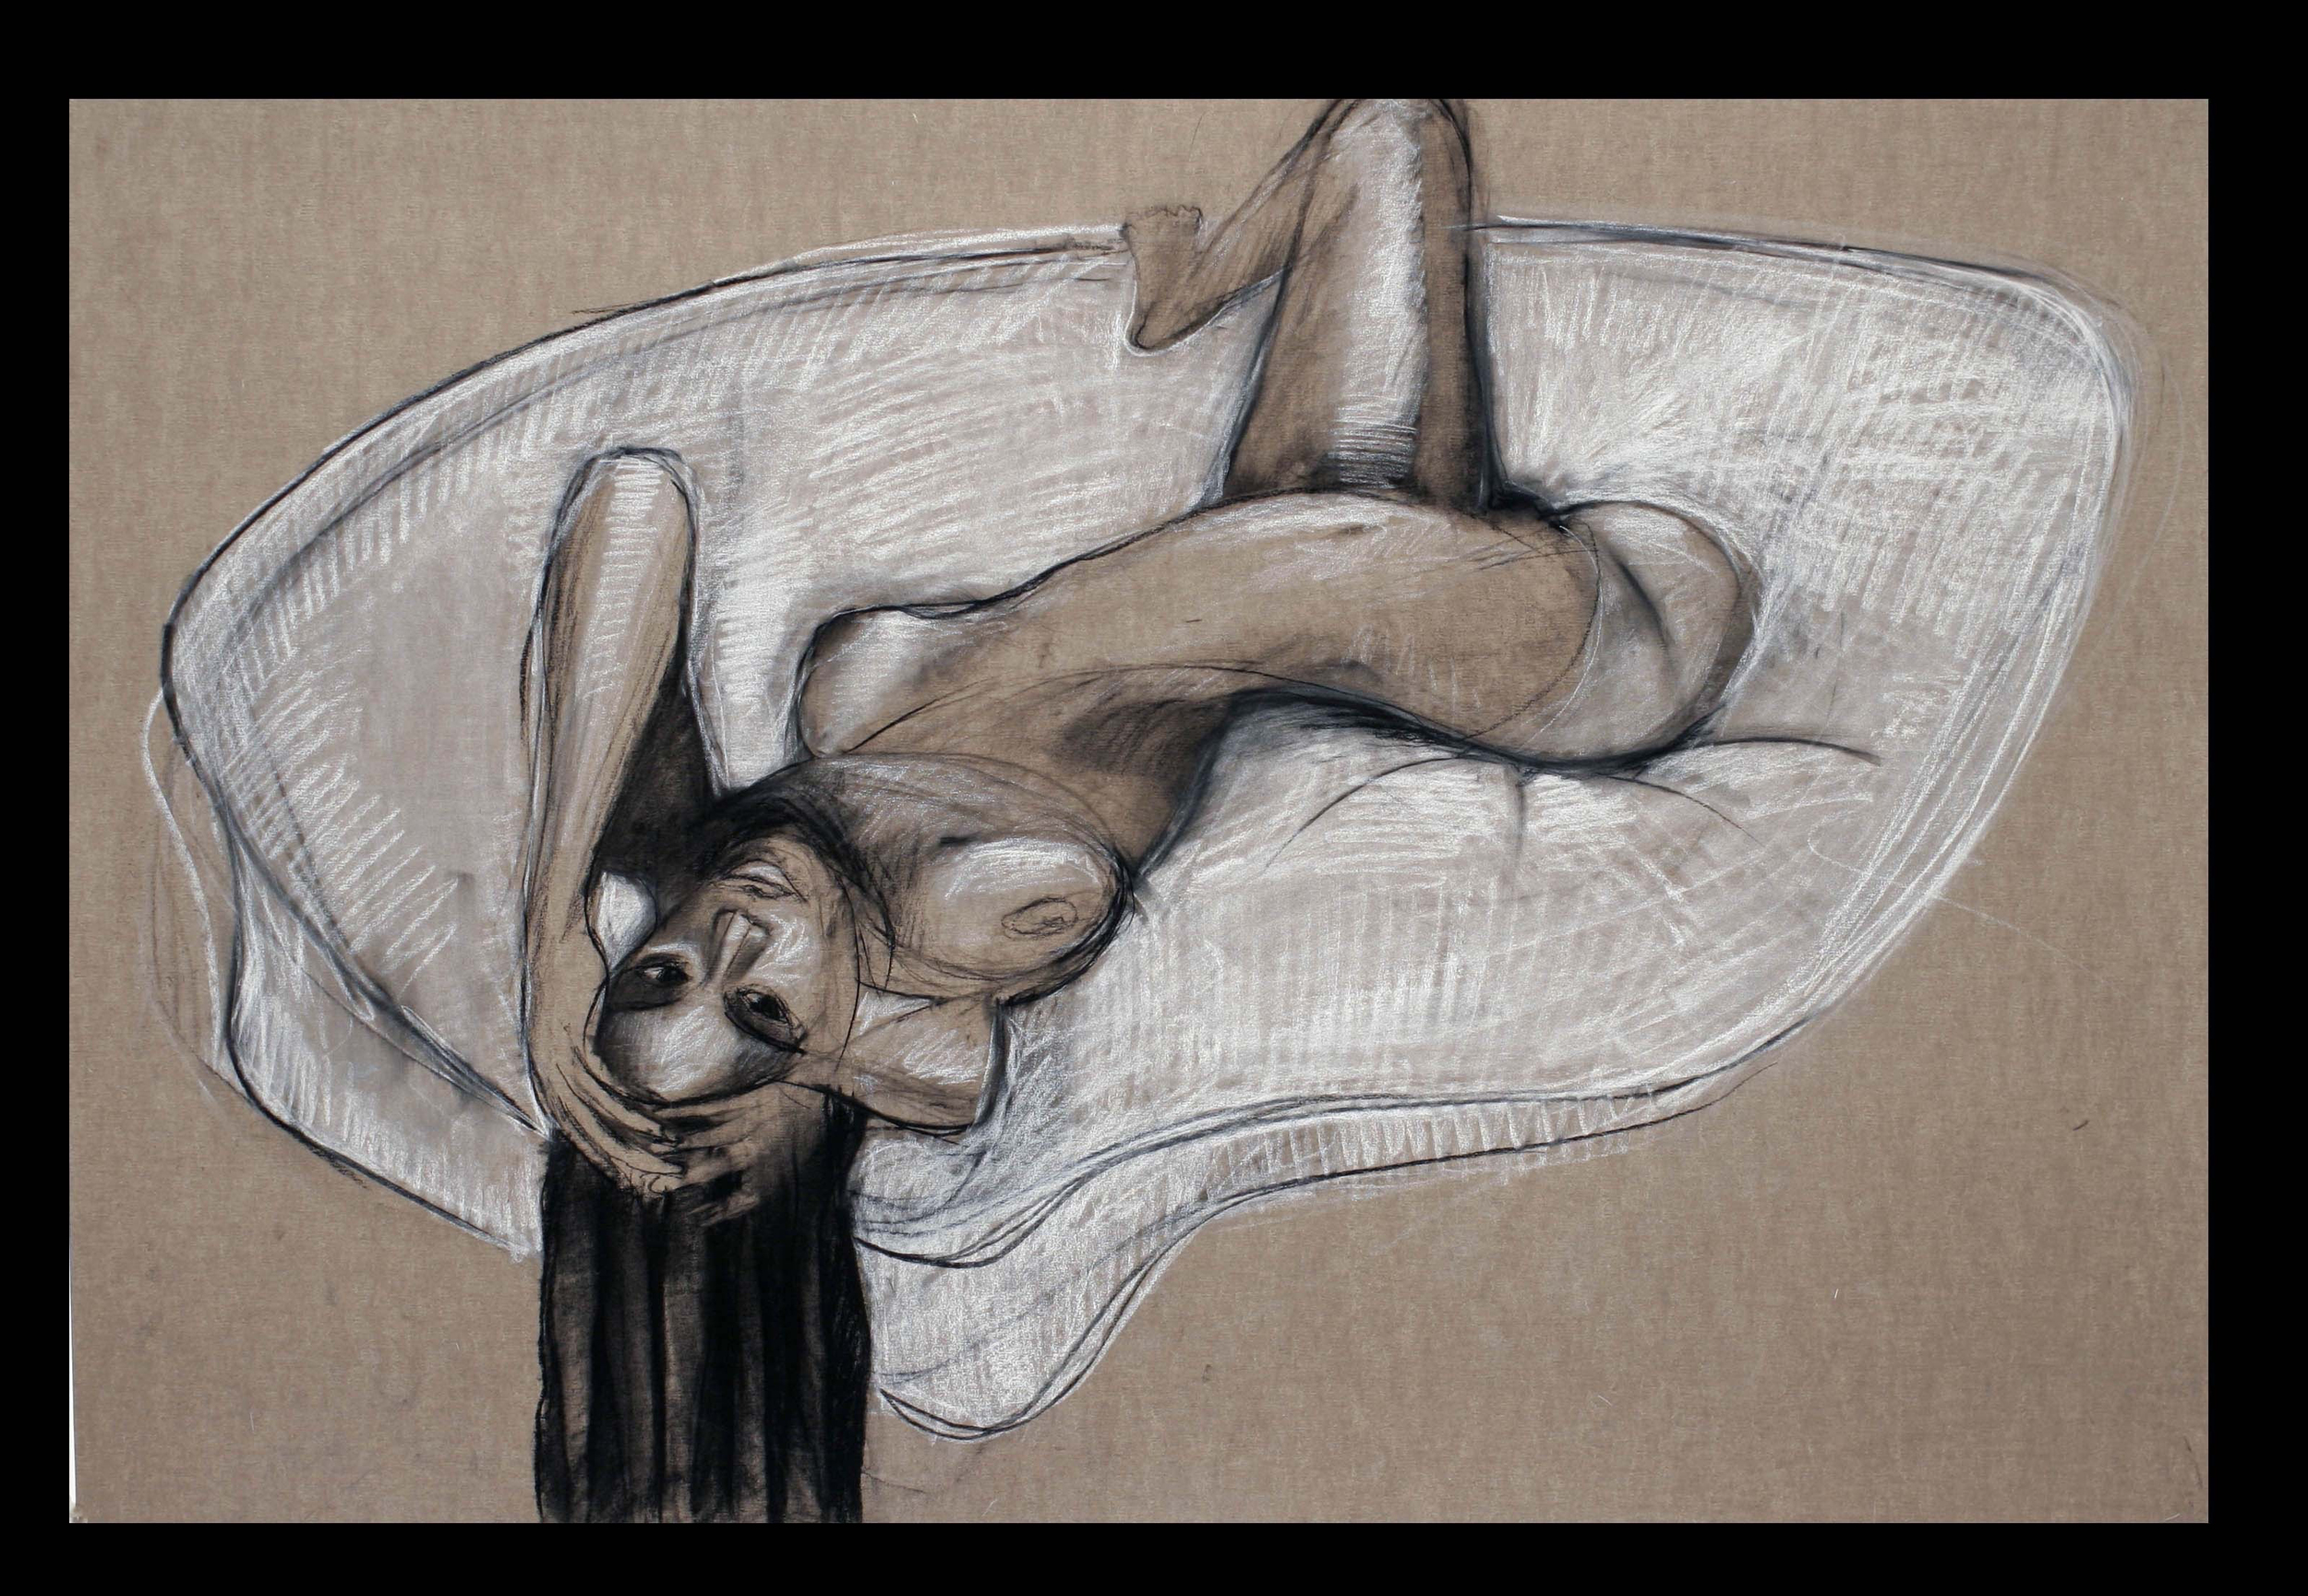 2010  Belgian sandpaper  22x30 Inches